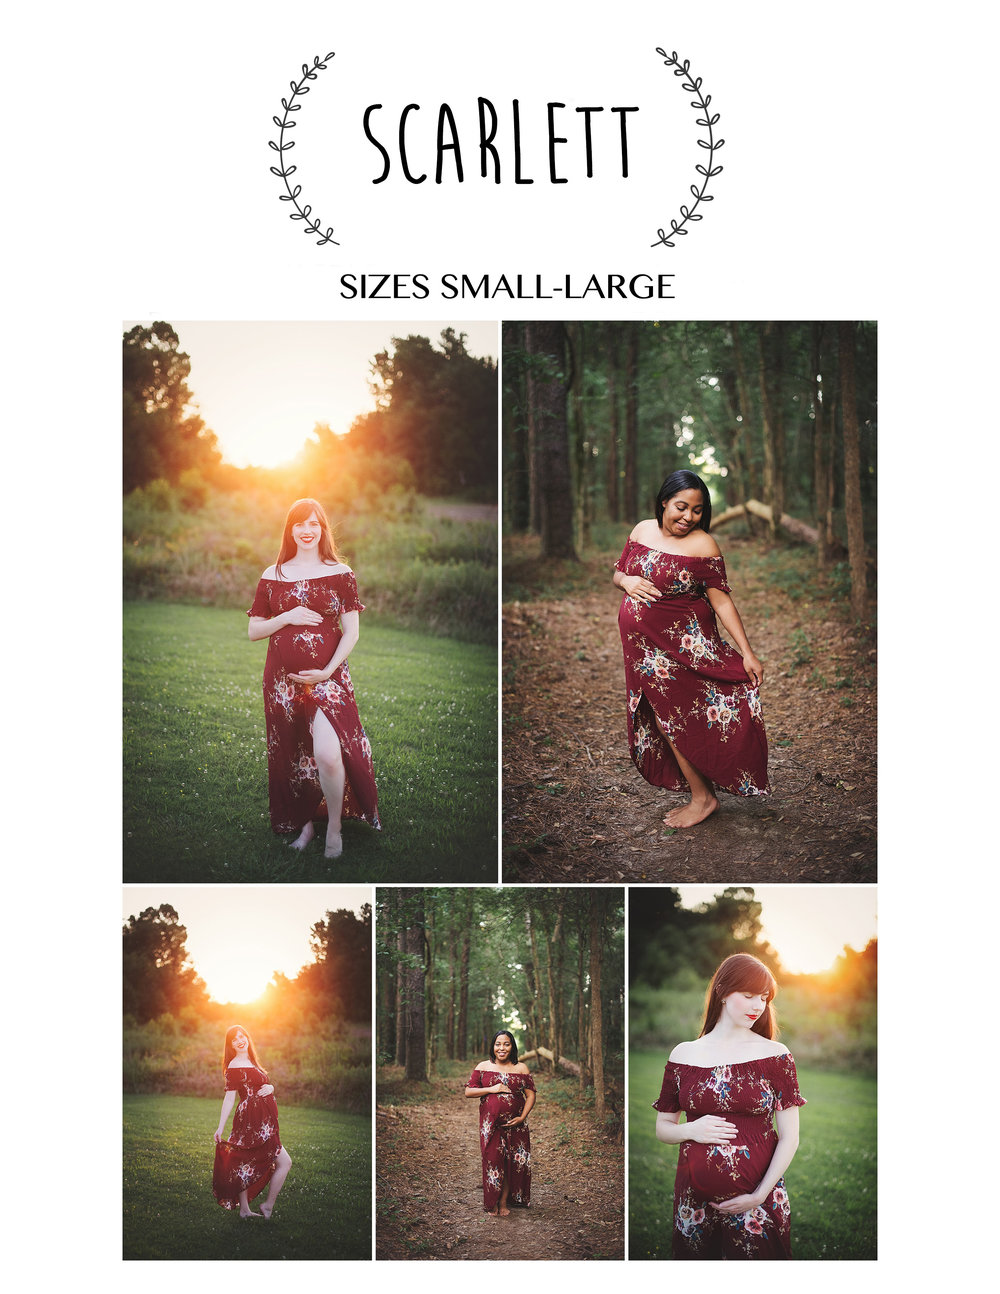 scarlettlookbook.jpg